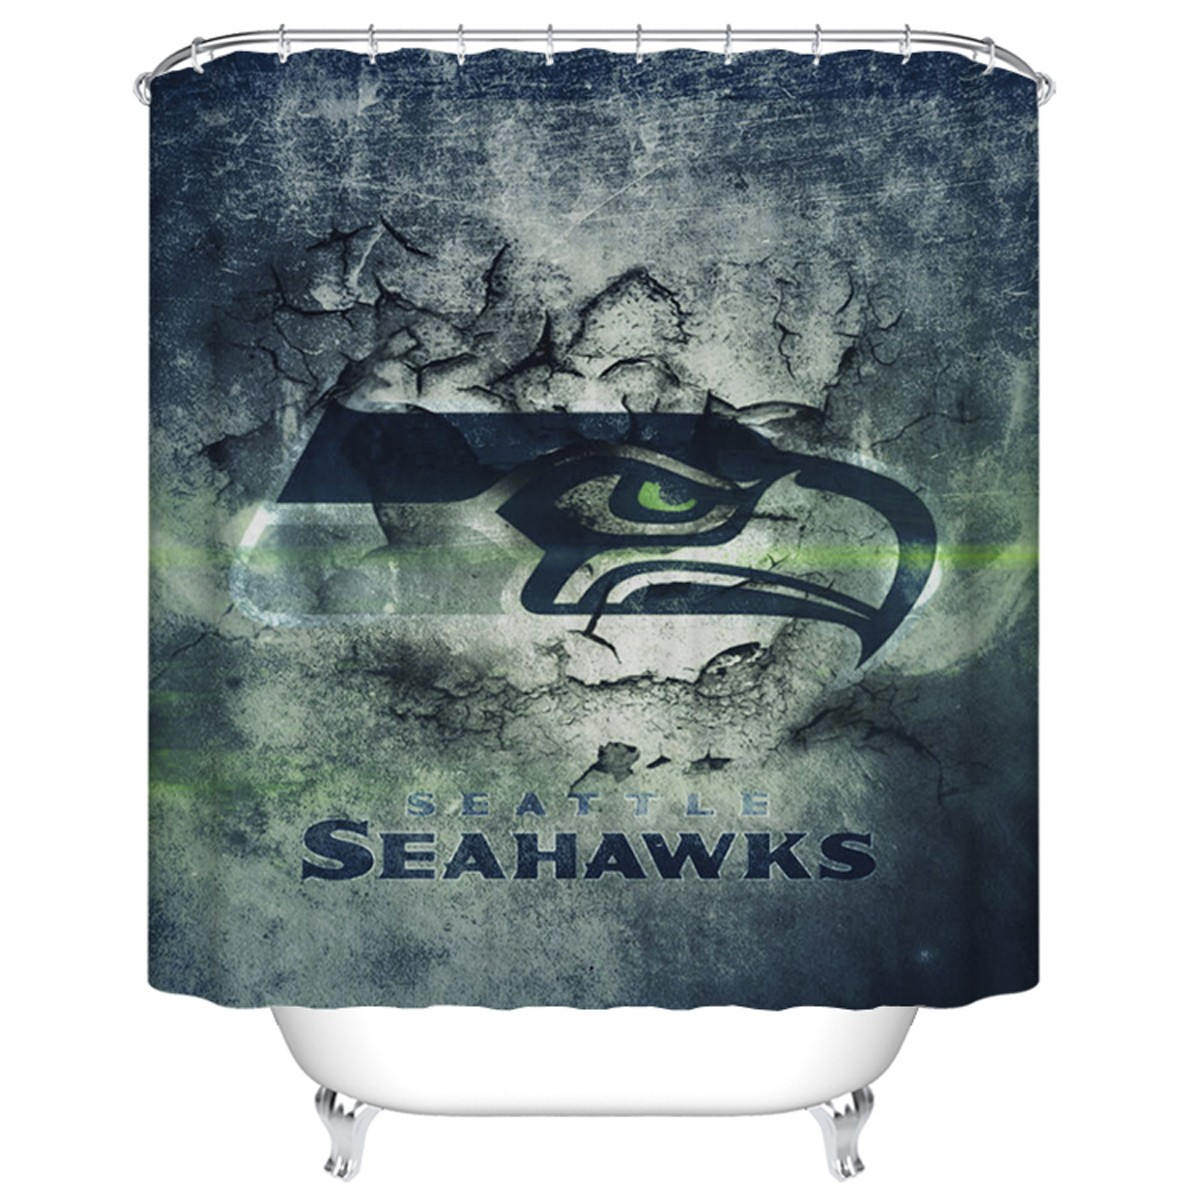 "Bathroom Waterproof Shower Curtain, 70"" W x 72"" H (DK-YT019)"